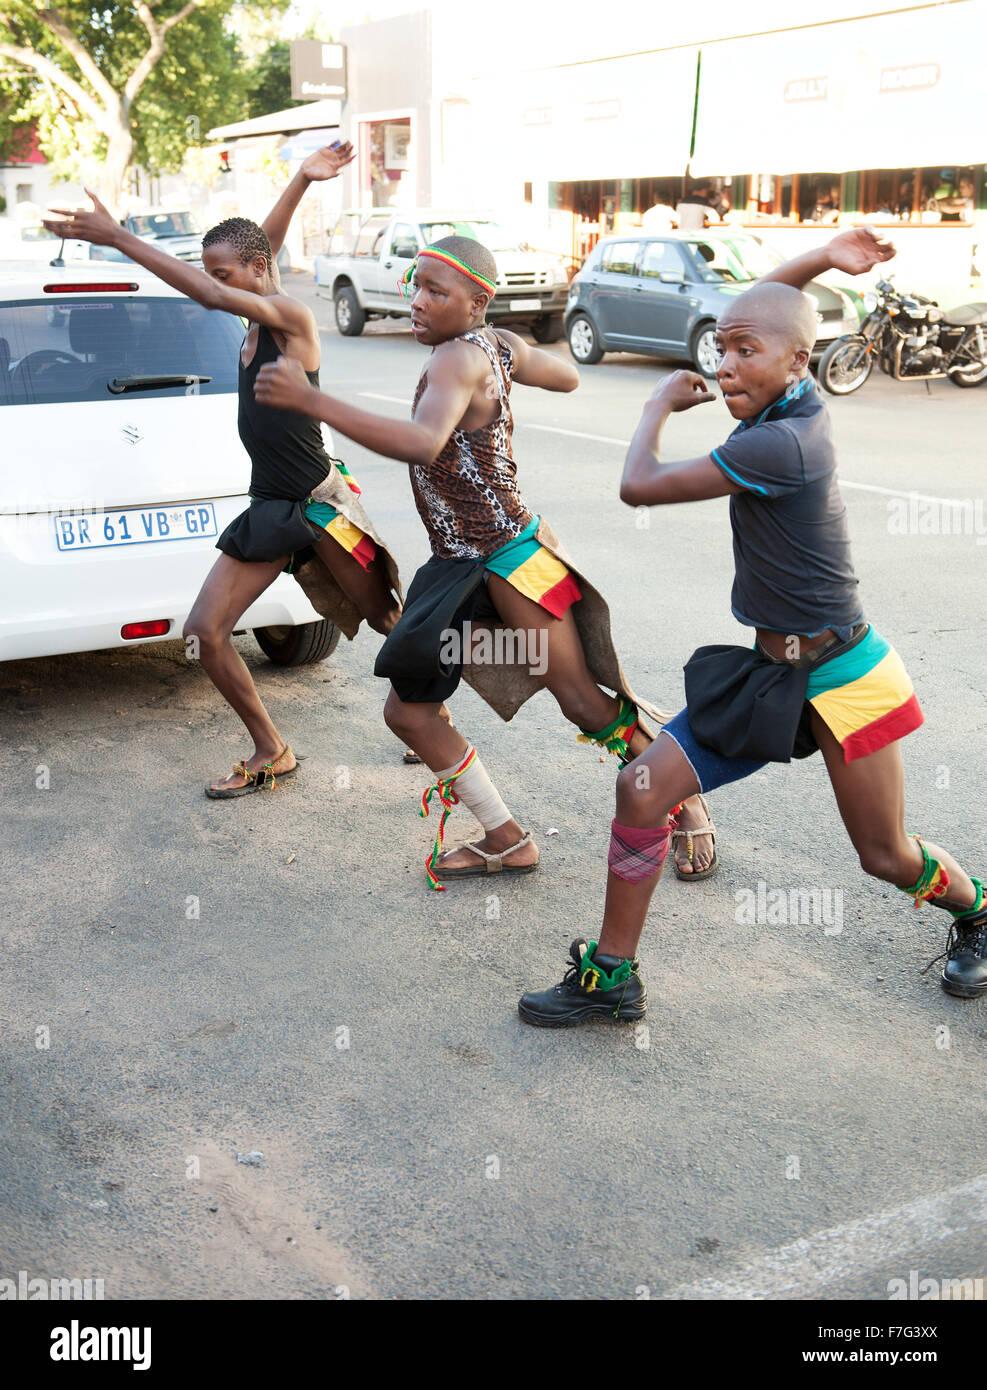 Zulu ballerini eseguono nel quartiere Pankhurst di Johannesburg, Sud Africa. Immagini Stock